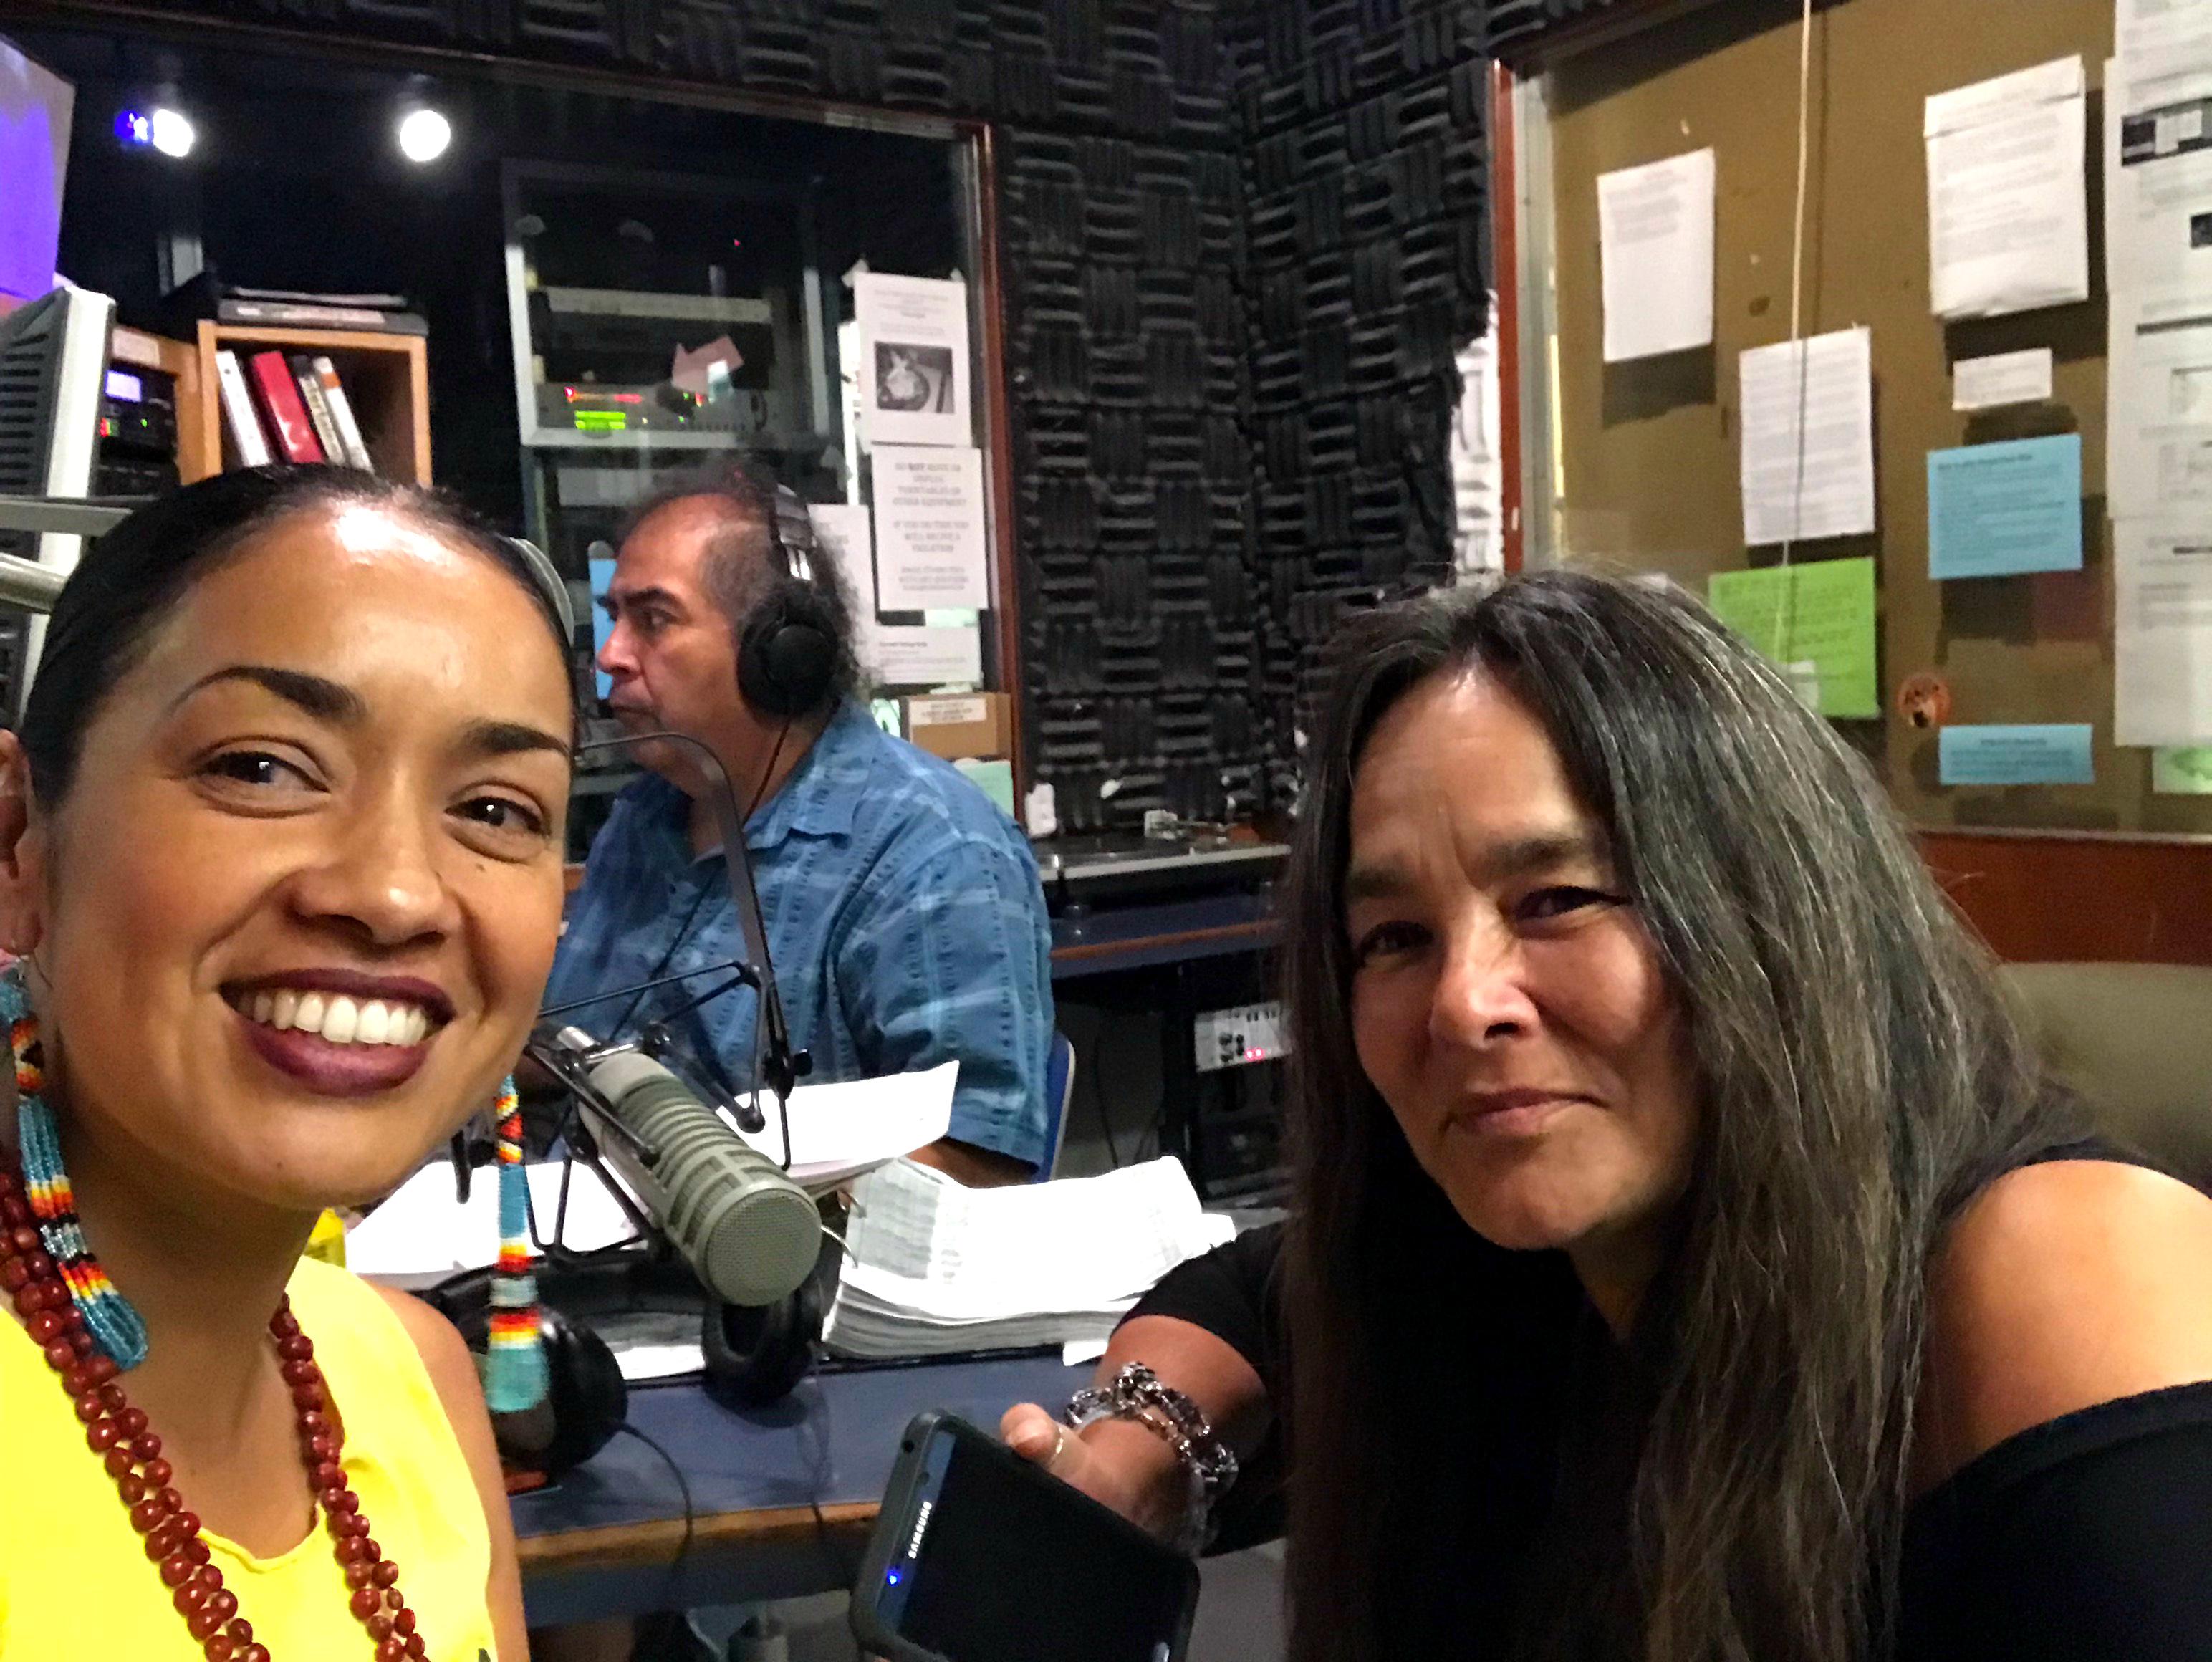 CA_Woodland_KDVS_Radio_interview_AdelitaSerena_MariaHunt_7837_CE.jpg